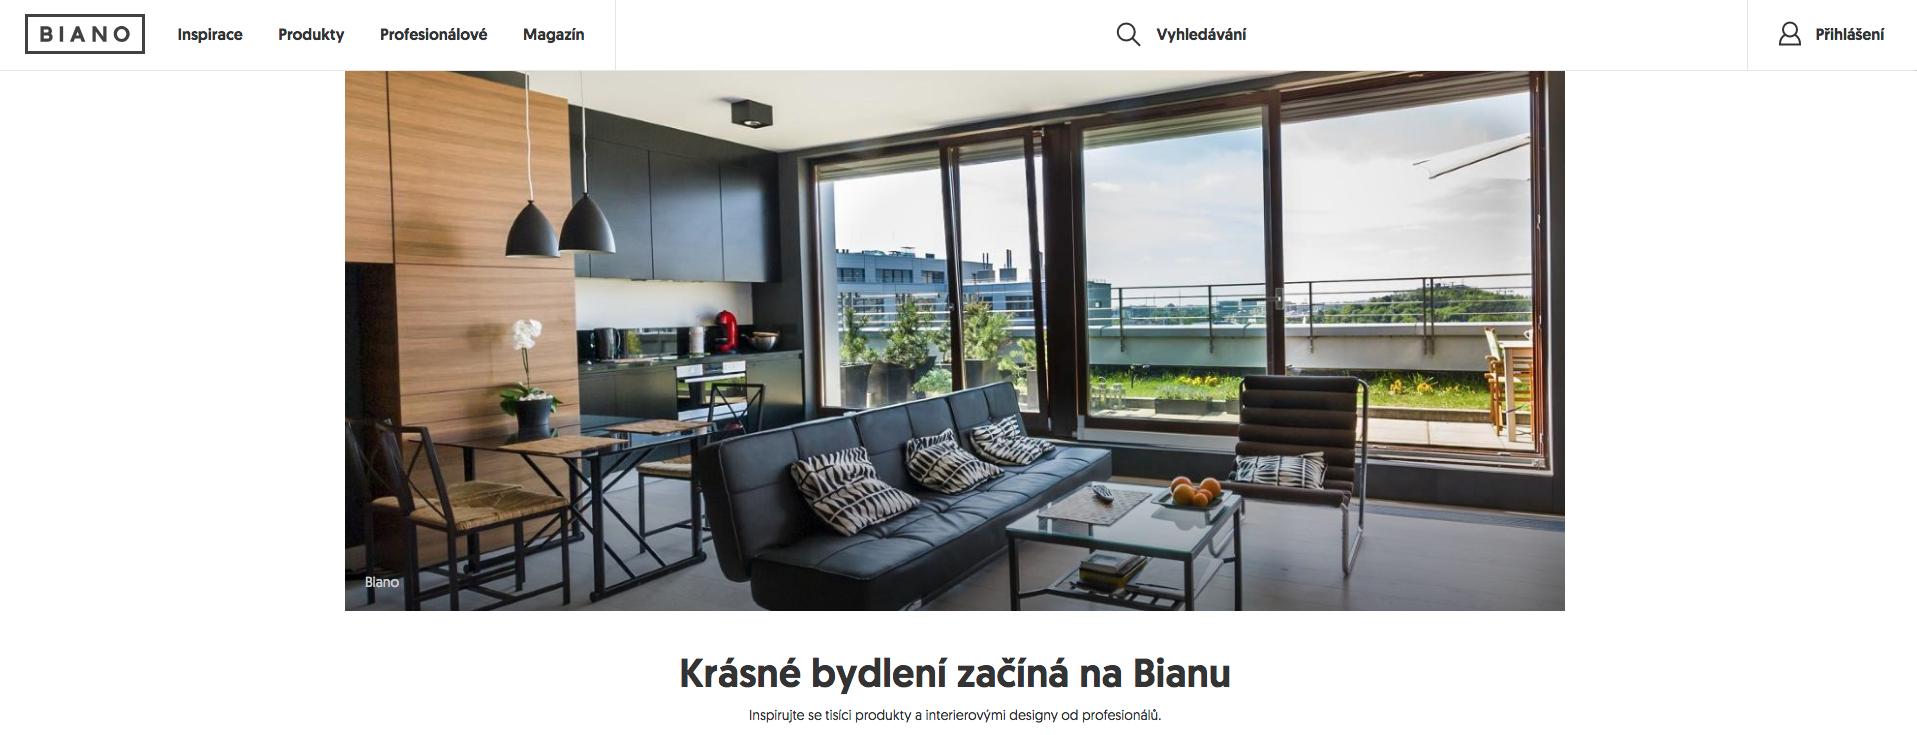 Biano.cz